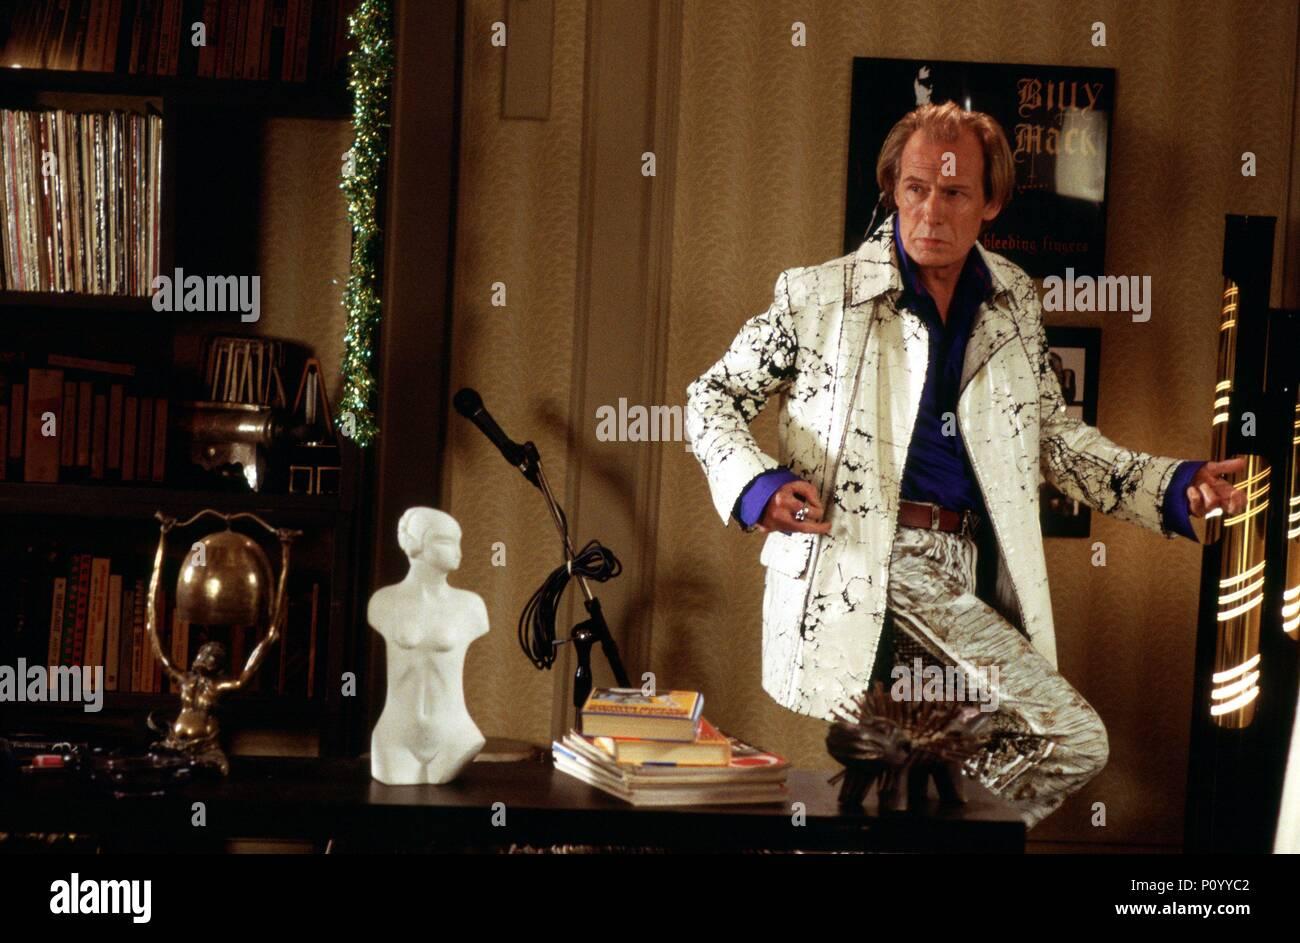 Original Film Title: LOVE ACTUALLY.  English Title: LOVE ACTUALLY.  Film Director: RICHARD CURTIS.  Year: 2003.  Stars: BILL NIGHY. Credit: UNIVERSAL STUDIOS / MOUNTAIN, PETER / Album - Stock Image